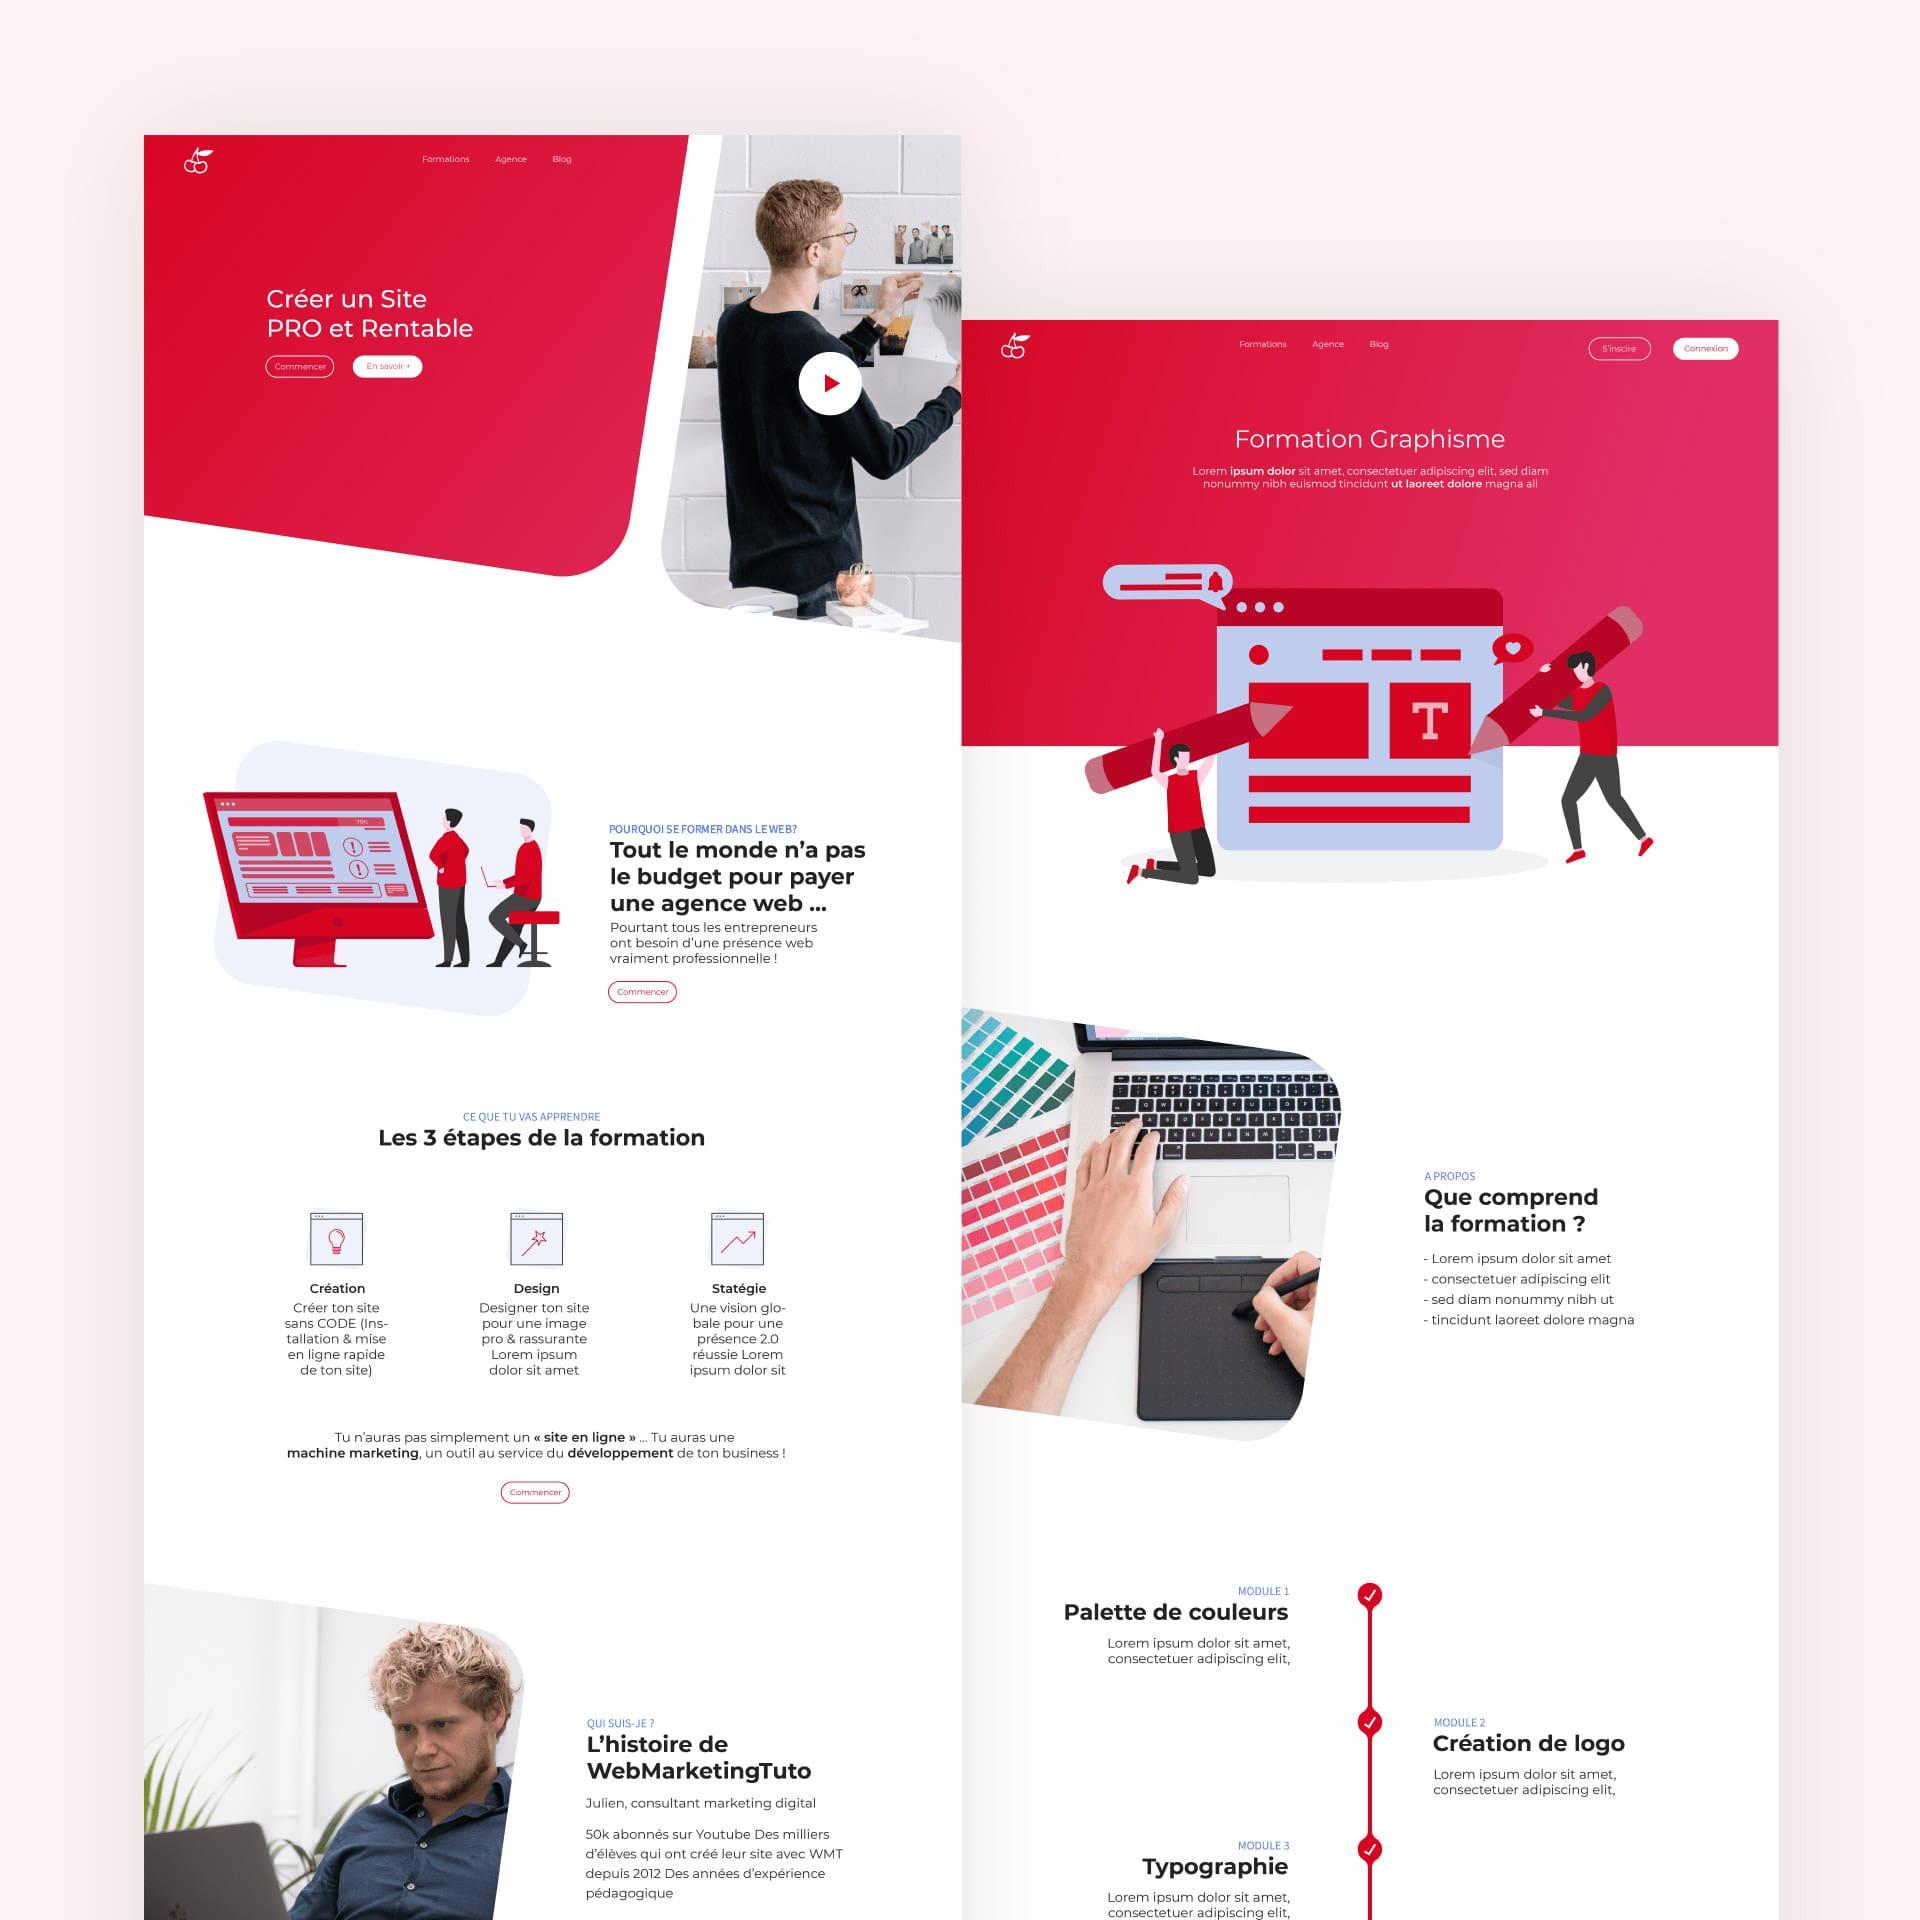 jd-design-webdesign-ui-ux-bordeaux2-min